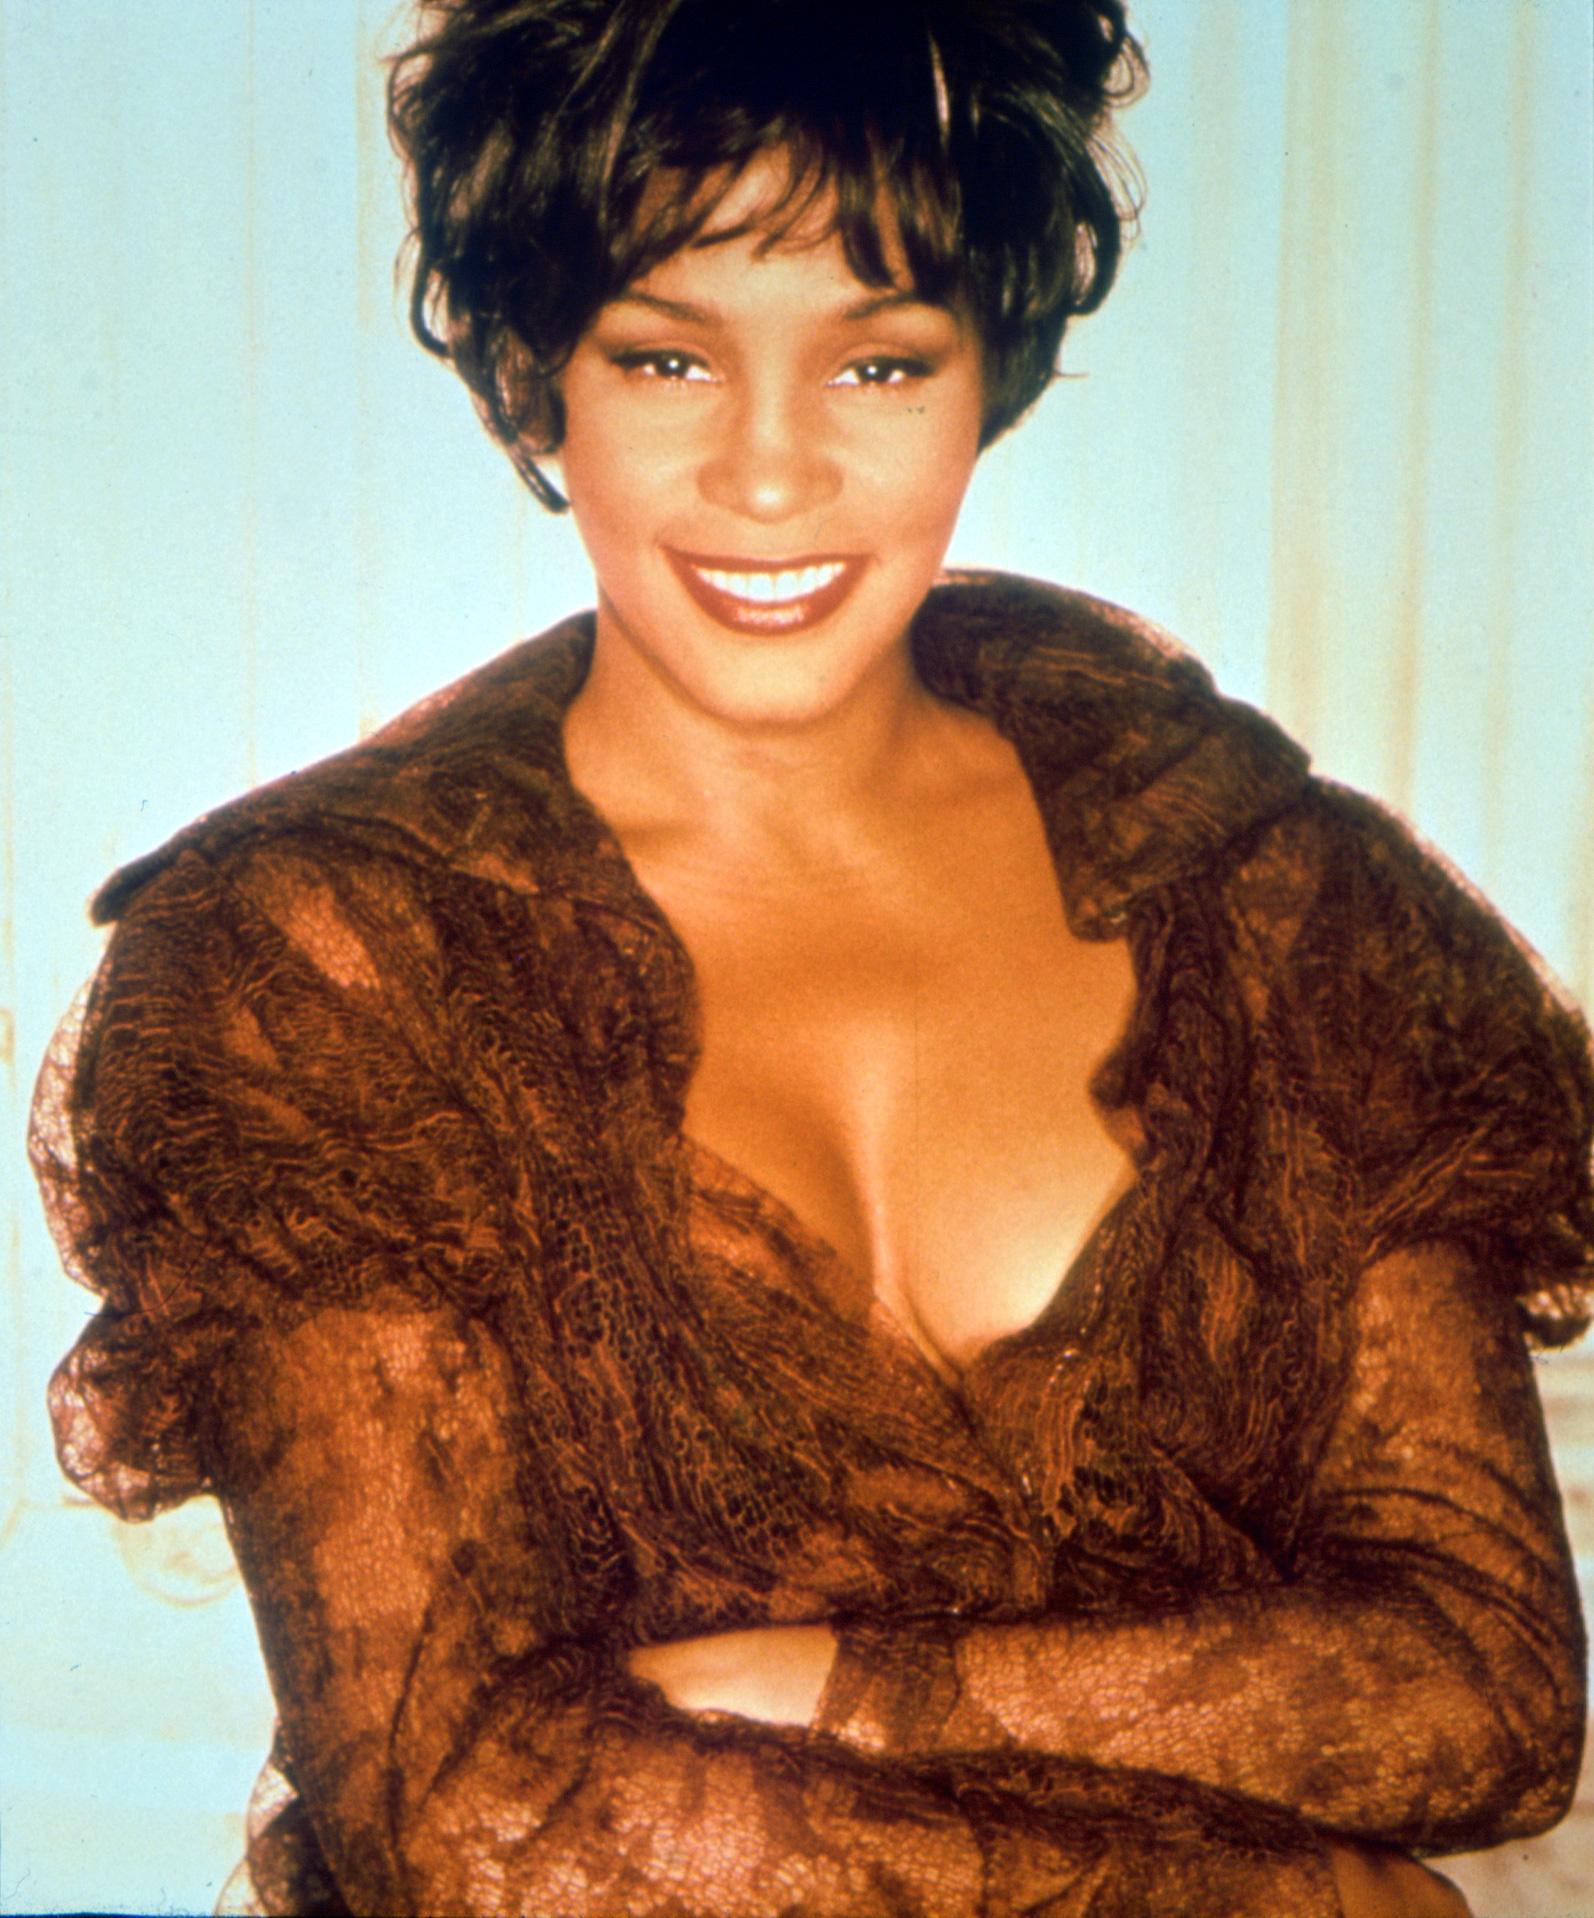 Stark dokumentär om Whitney Houston.